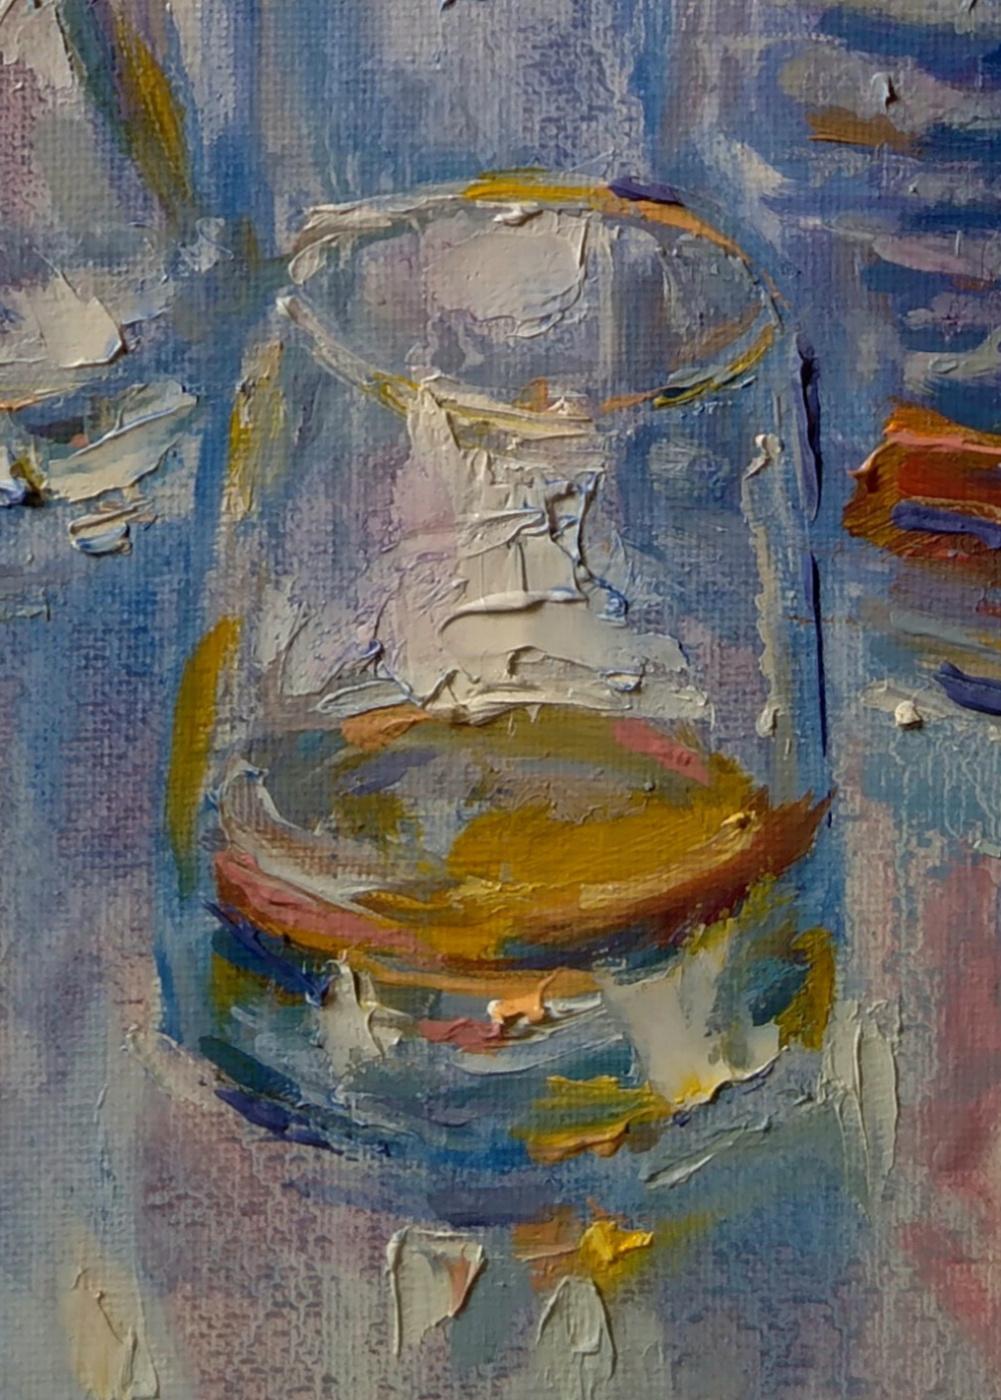 Shot glass of Jack